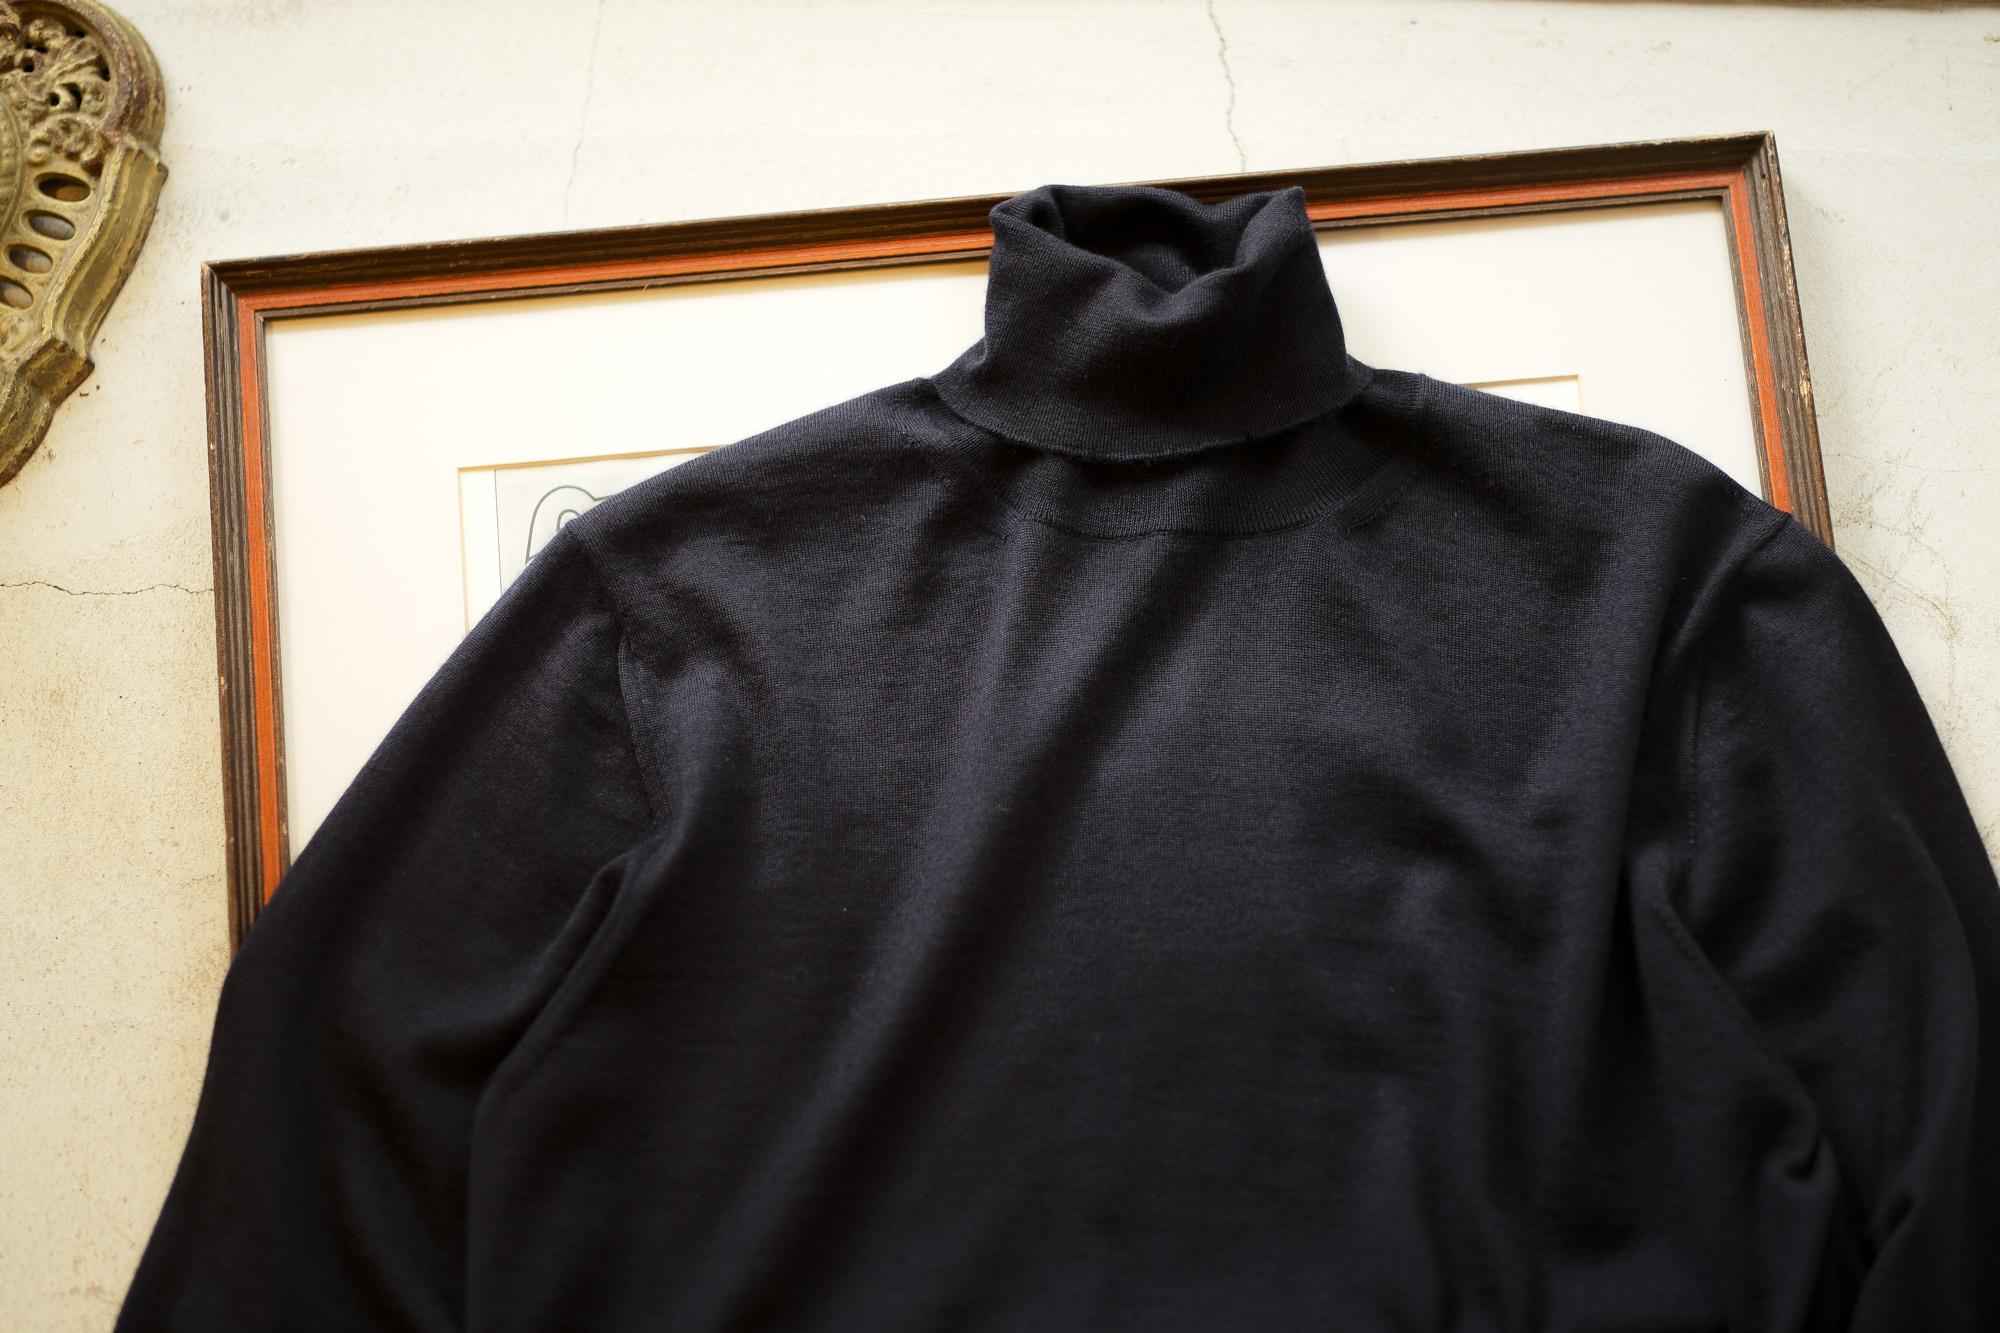 Cruciani (クルチアーニ) Silk Cashmere Turtle Neck Sweater (シルクカシミヤ タートルネック セーター) NAVY (ネイビー・5508D) made in italy (イタリア製) 2019 秋冬新作 愛知 名古屋 altoediritto アルトエデリット